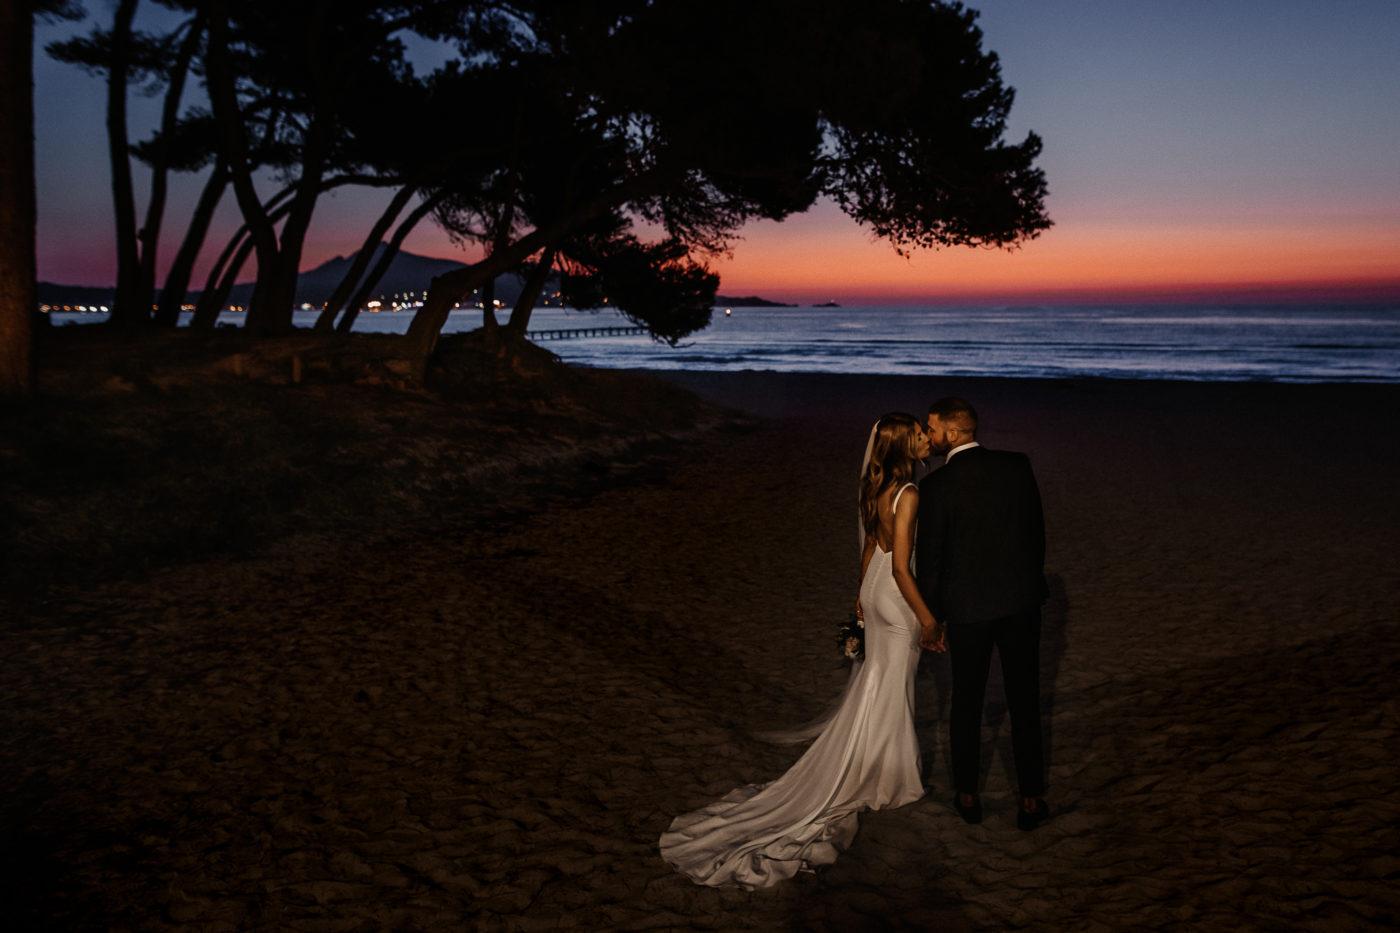 Brautpaar zum Sonnenaufgang auf Mallorca am Strand